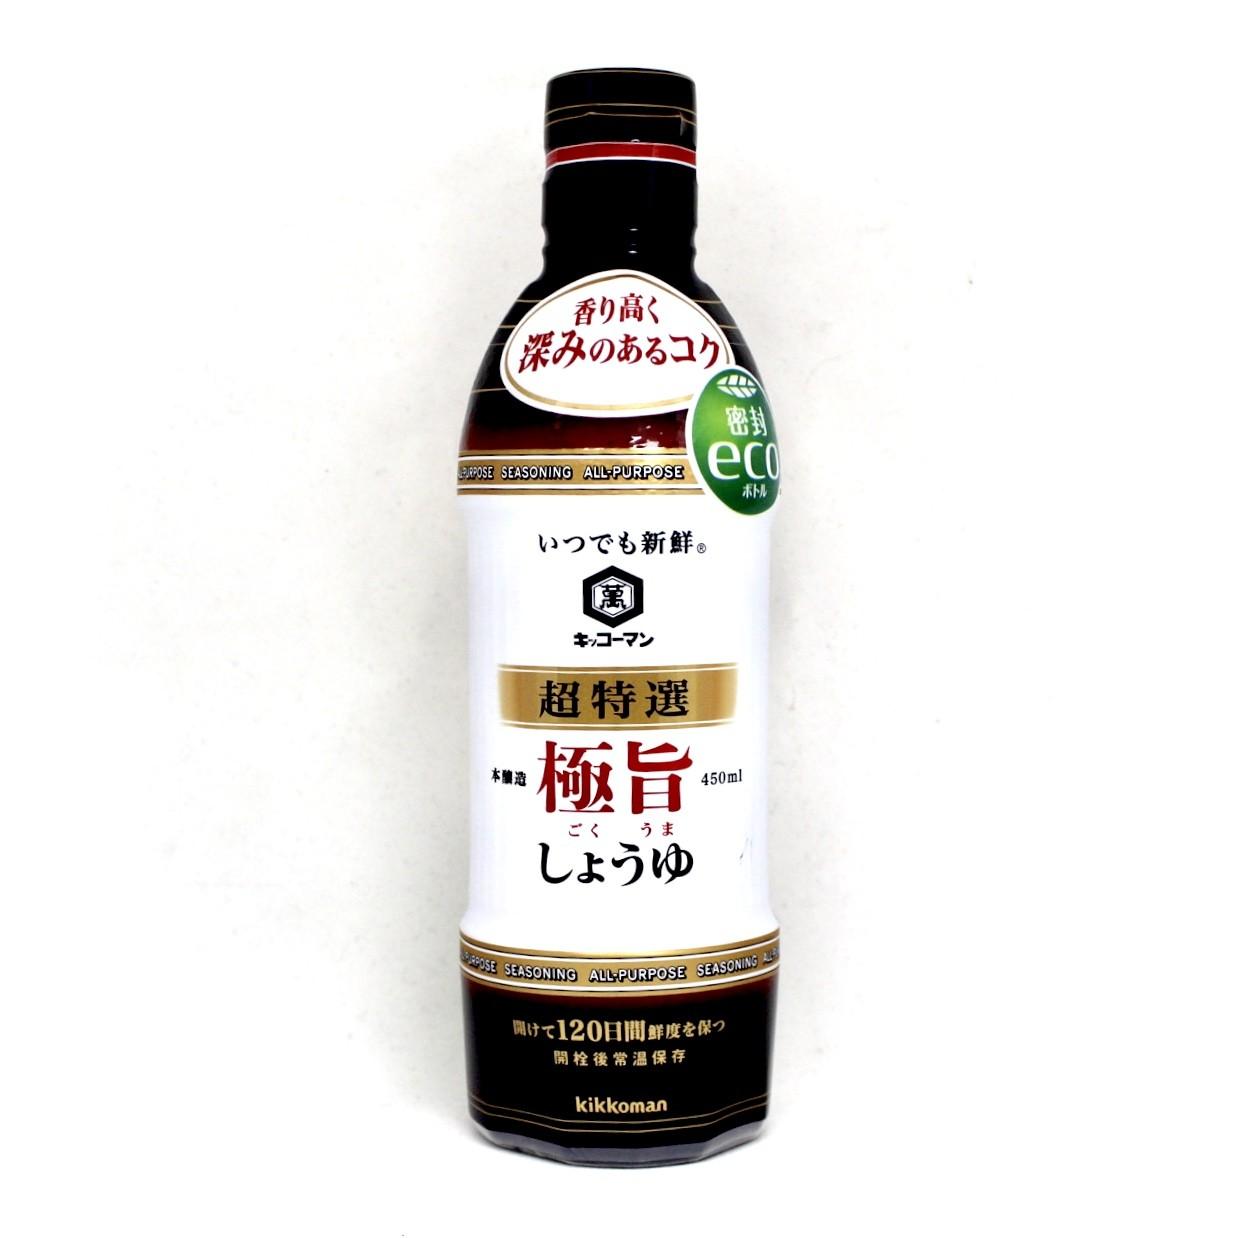 KIKKOMAN SHOYU CHOTOKUSEN GOKUUMA 450ml